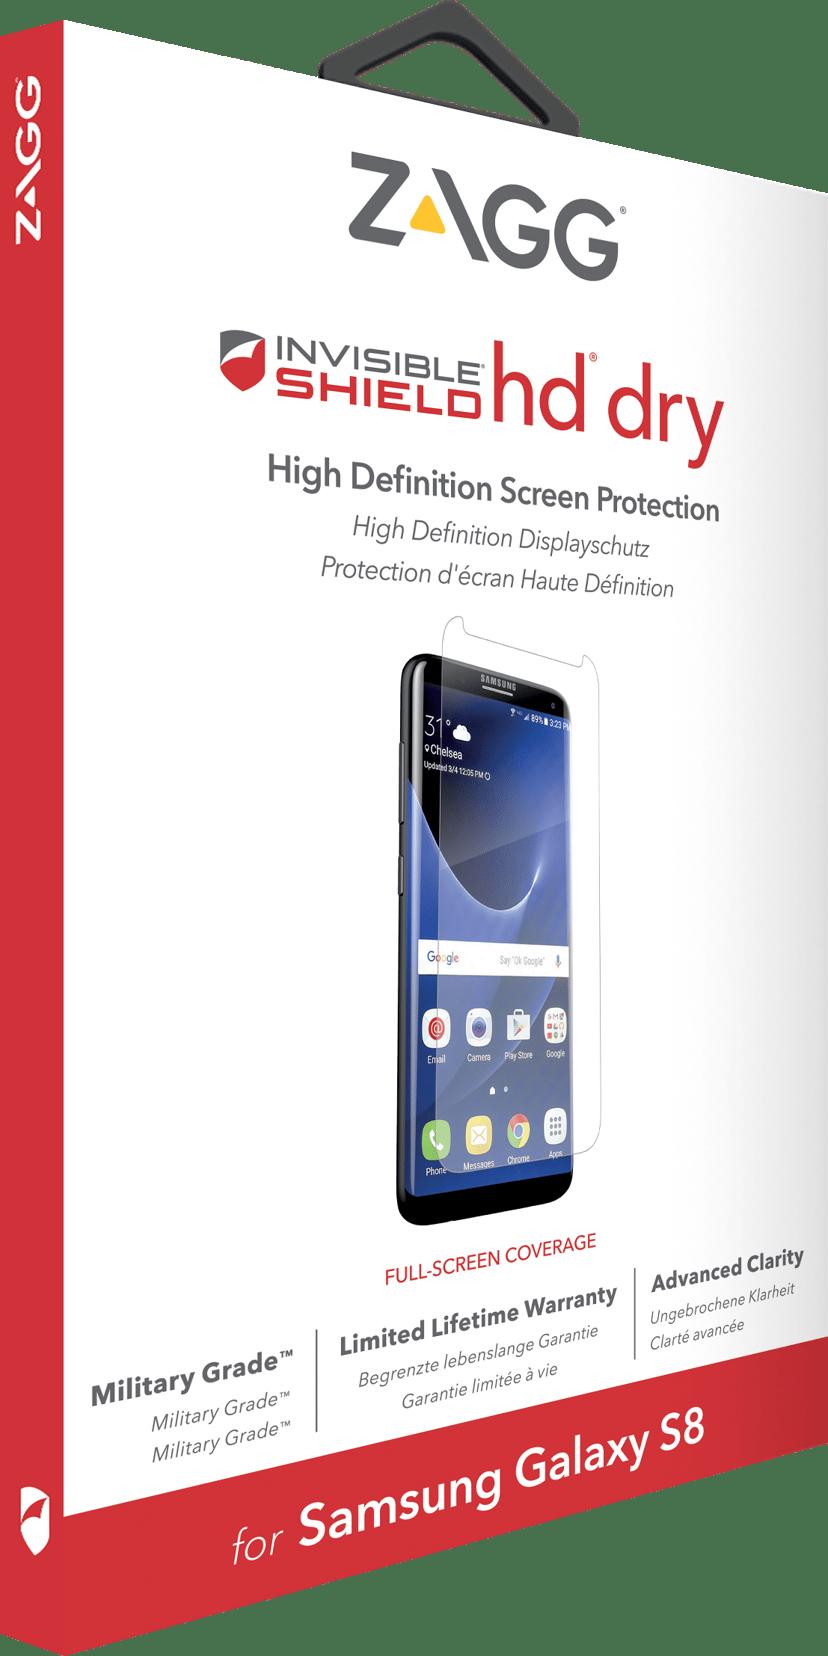 Zagg Invisibleshield HD Dry Screen Samsung Galaxy S8